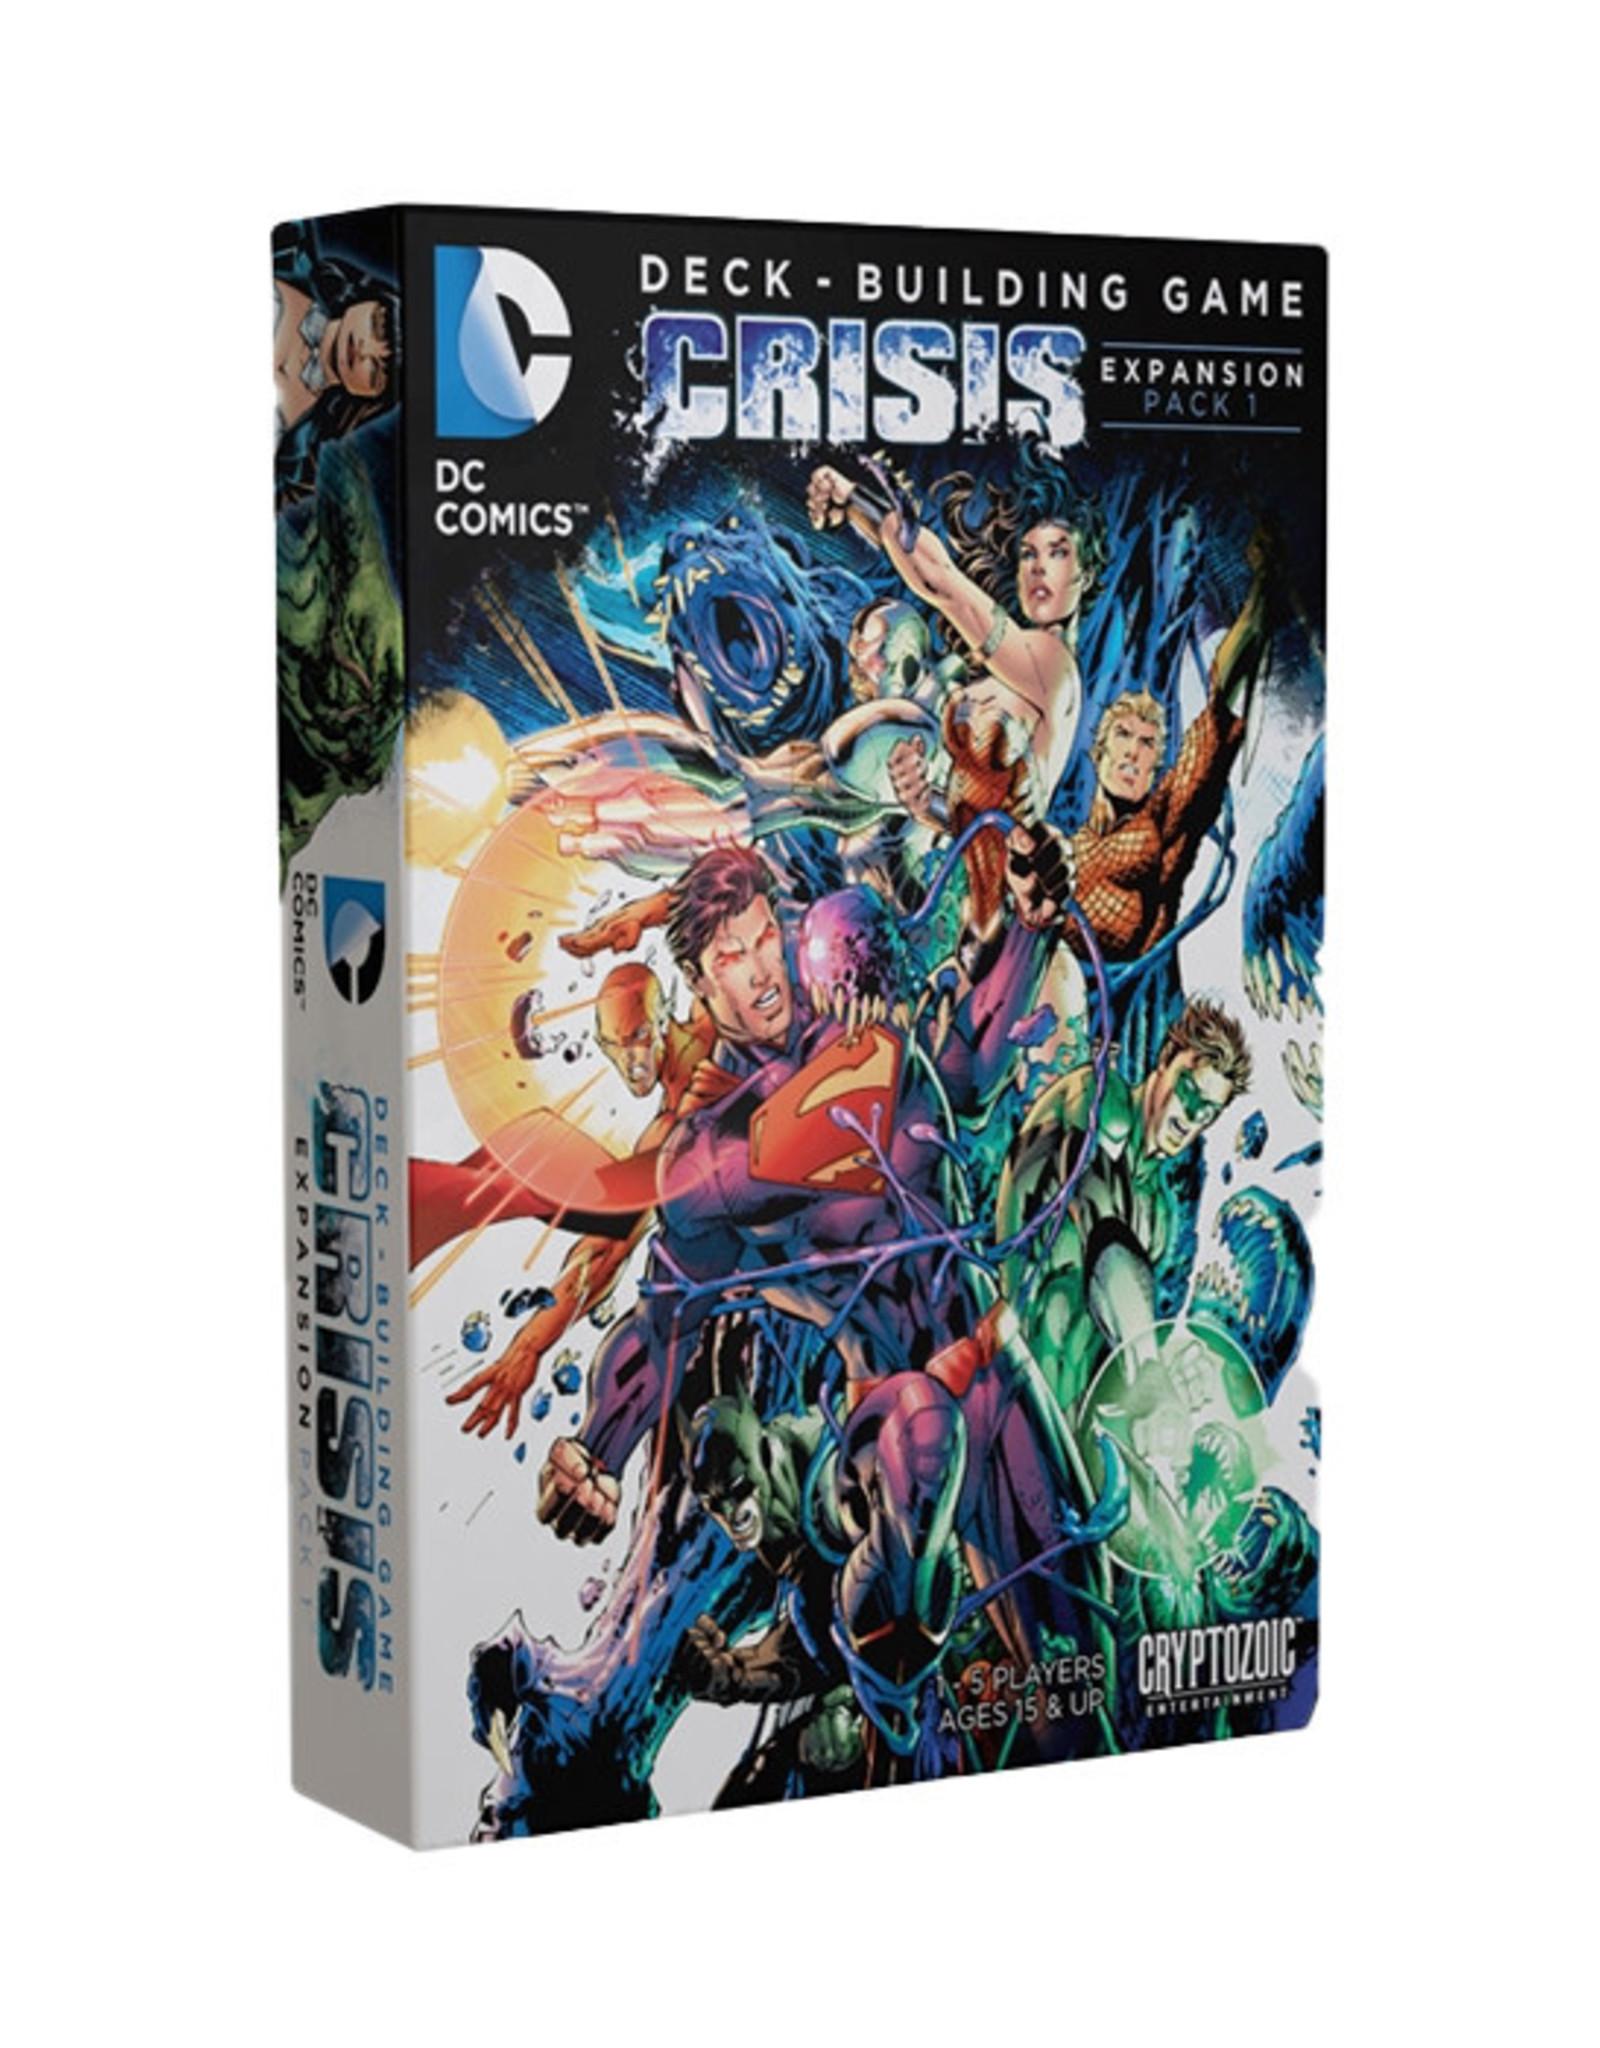 DC Deck Building Game: Crisis - Expansion Pack 1